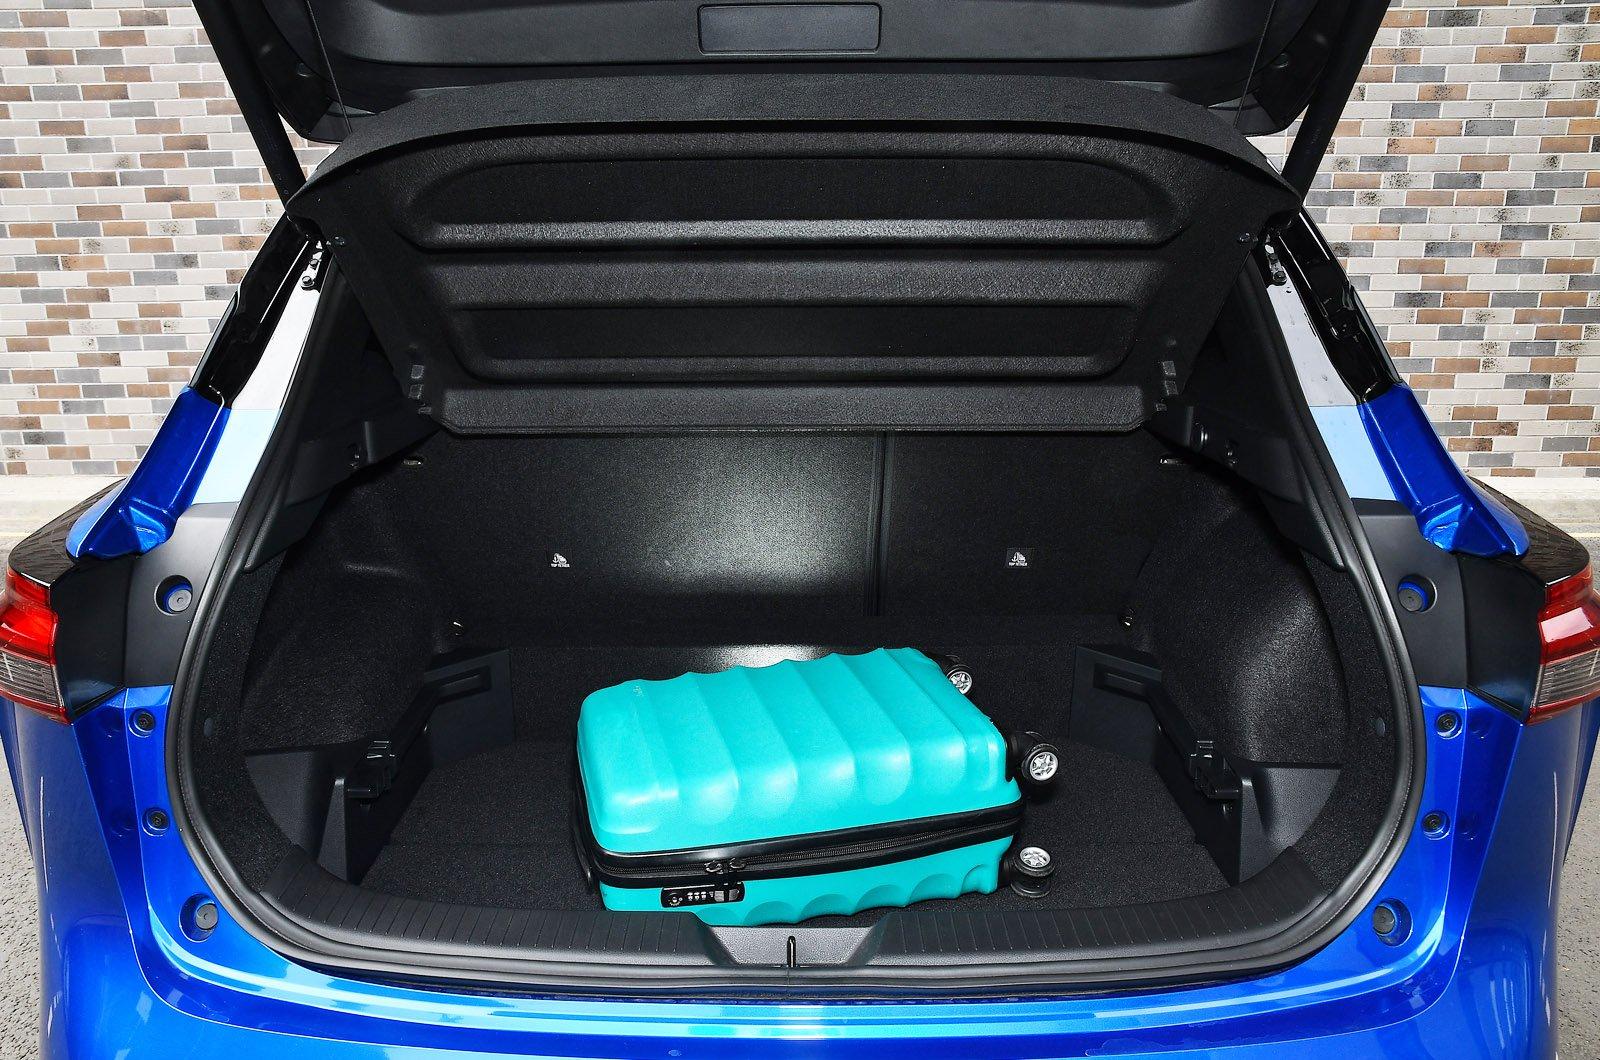 Nissan Qashqai 2021 boot